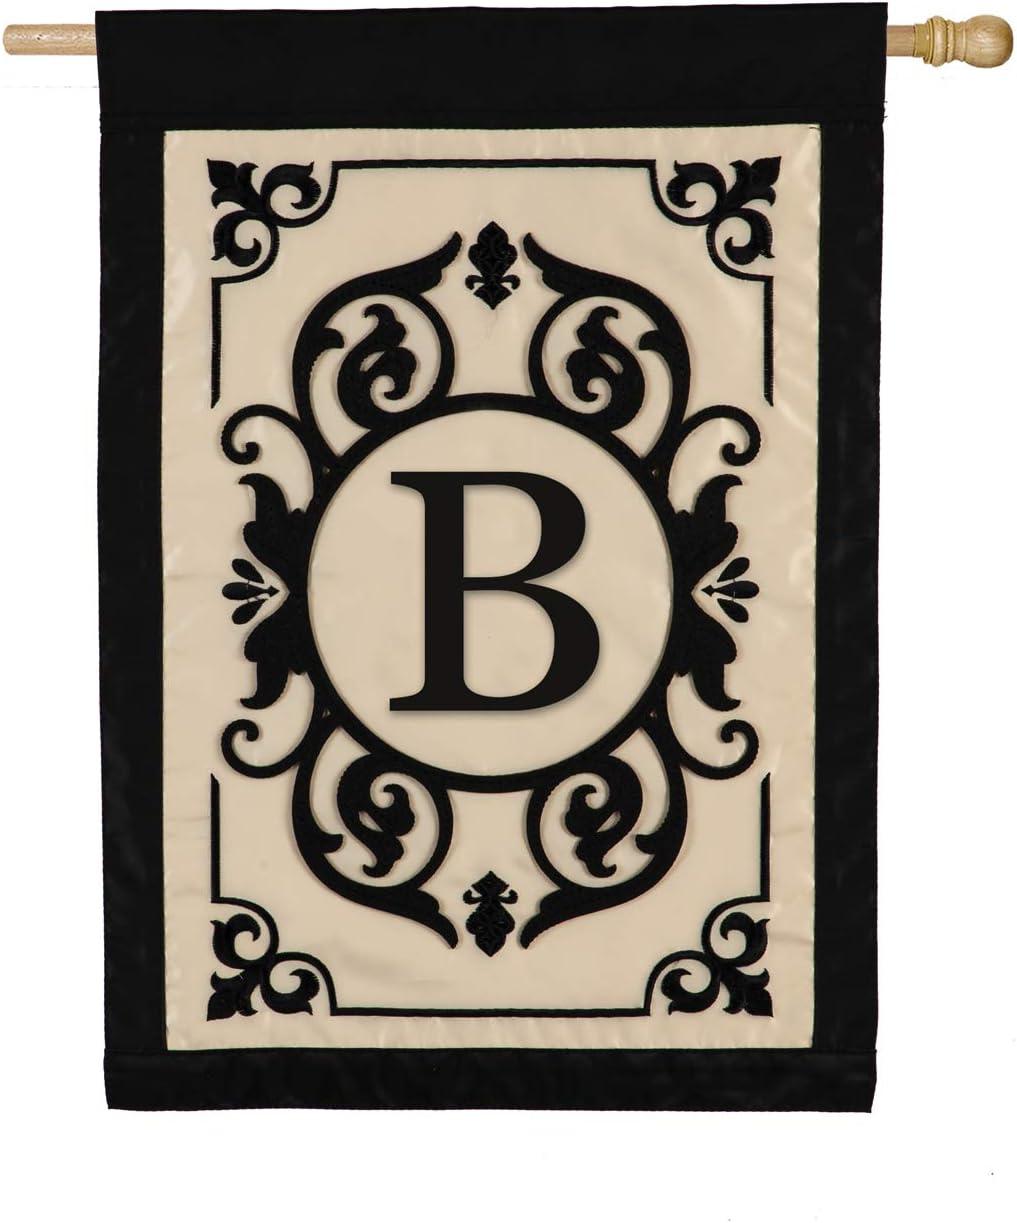 Cambridge Monogram House Applique Flag Letter B x 28 激安卸販売新品 44 I - 1 格安店